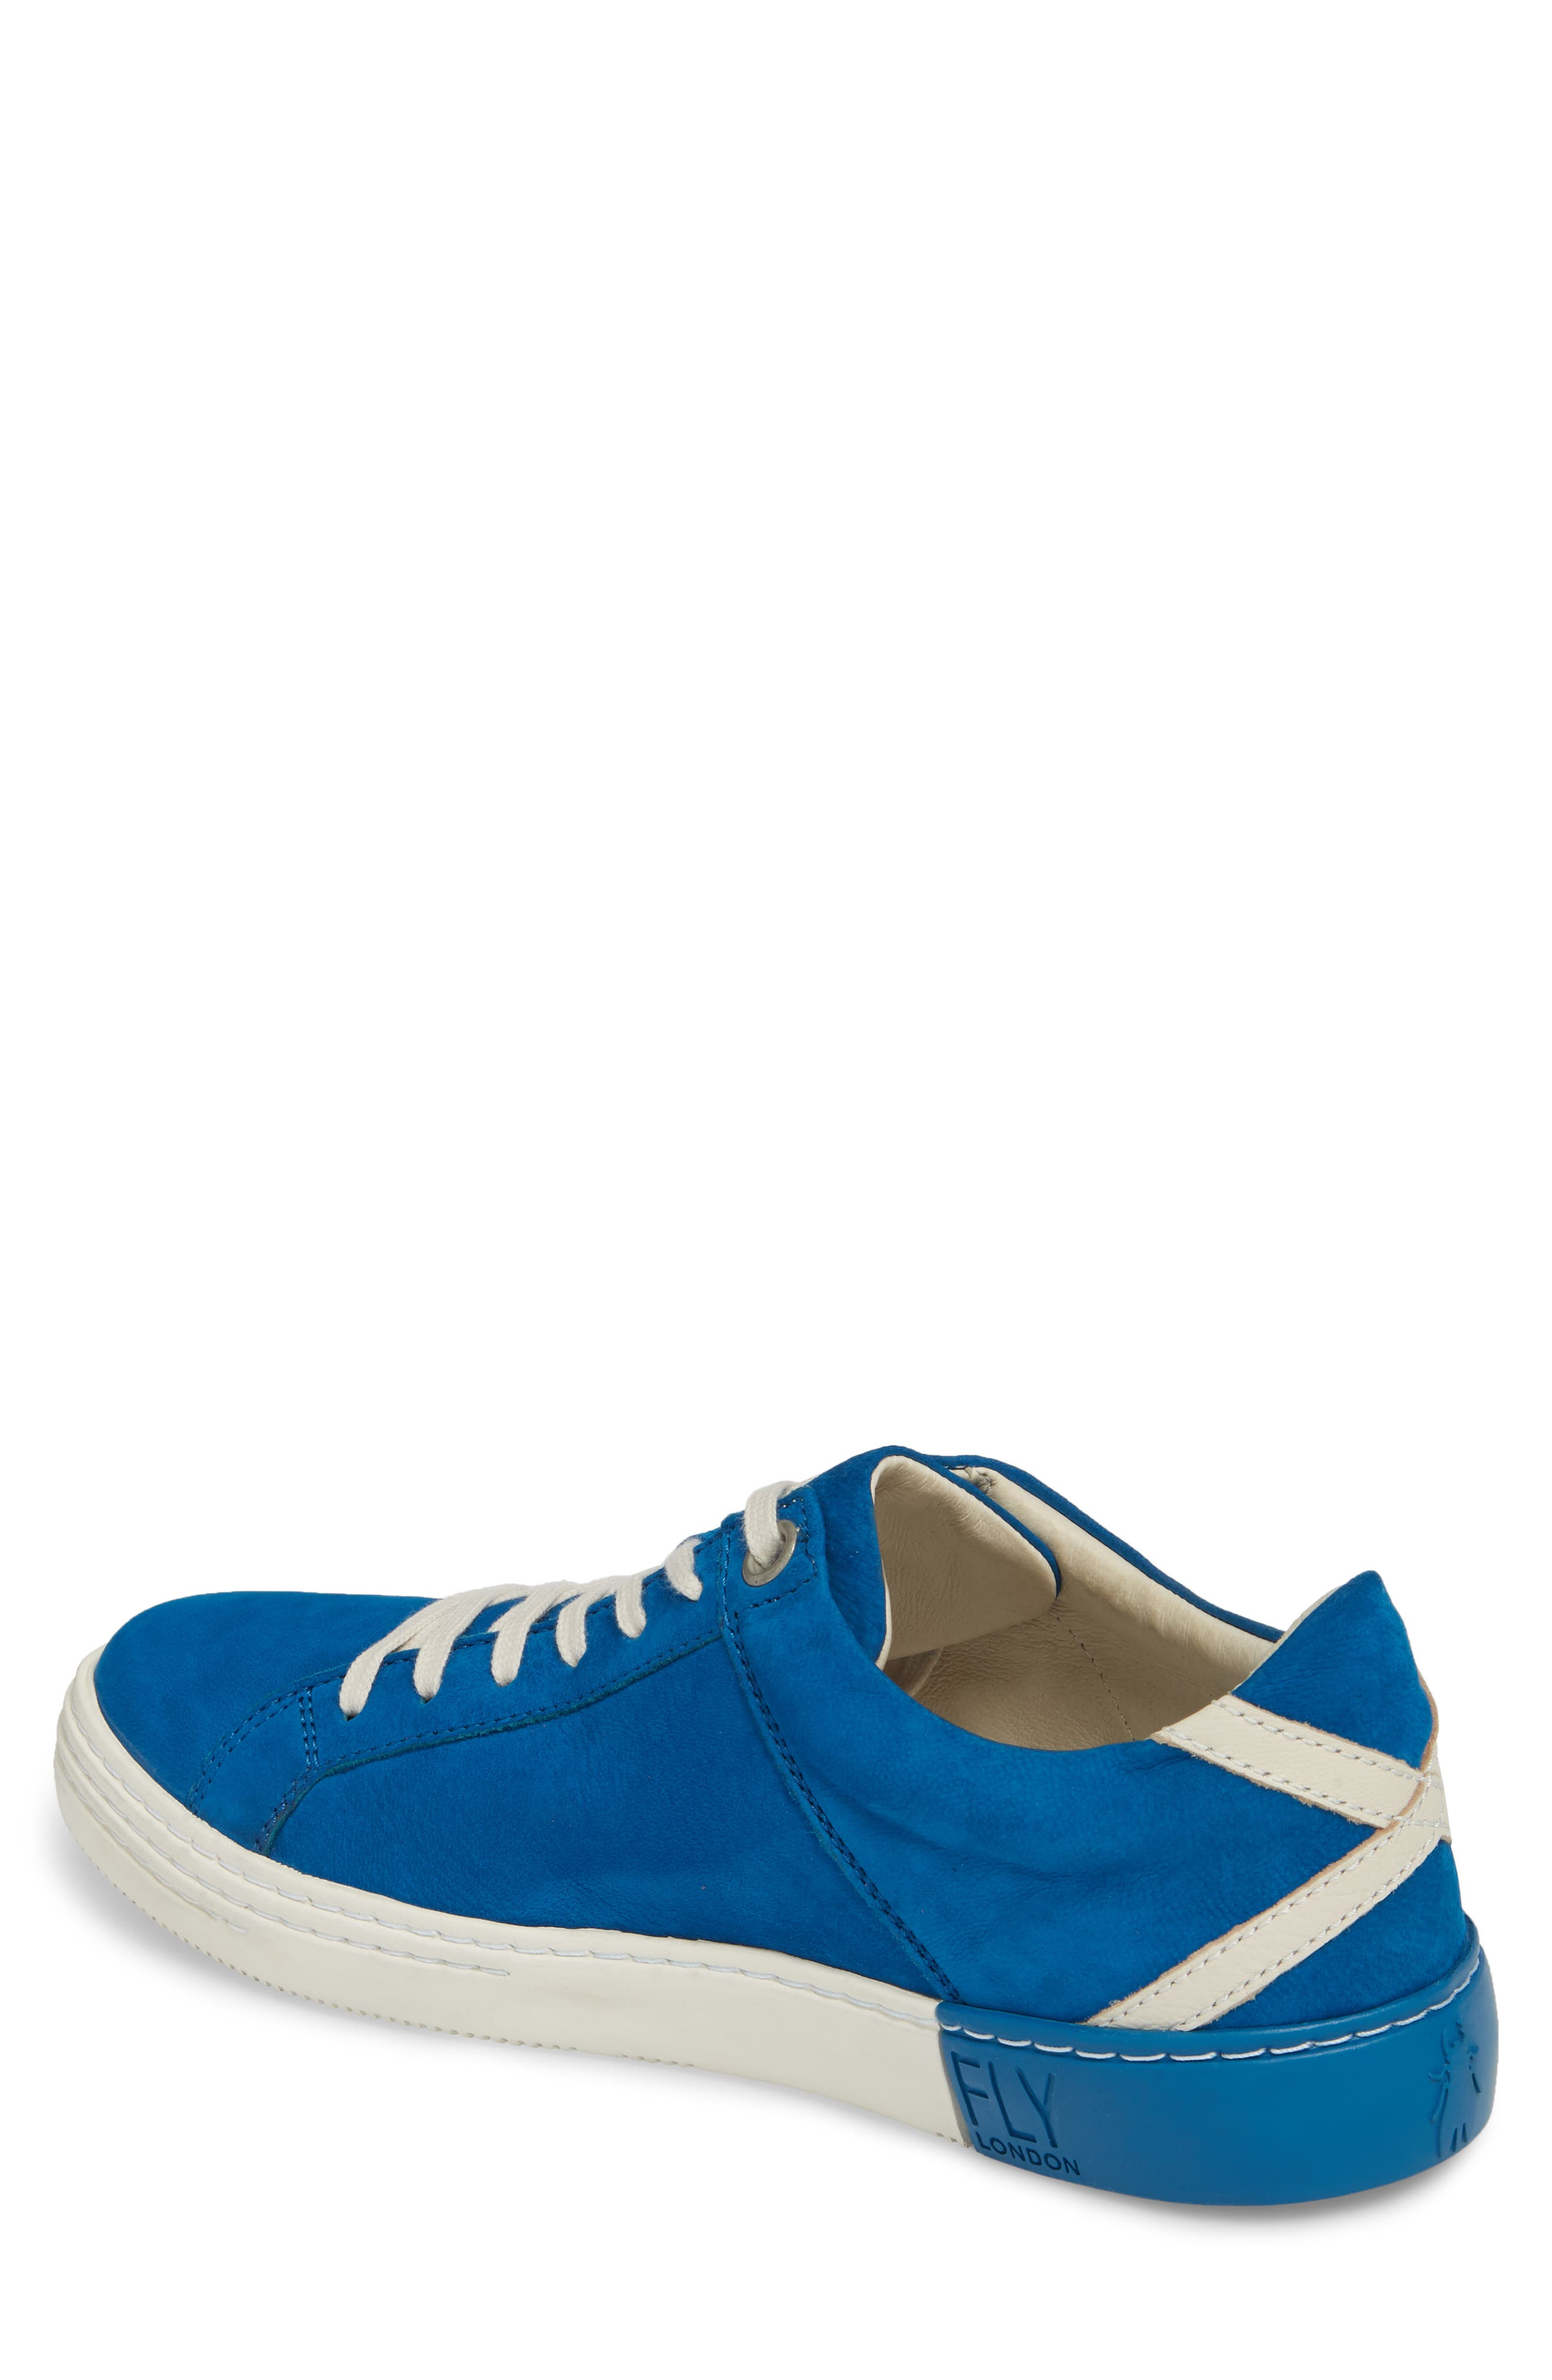 Sene Low Top Sneaker,                             Alternate thumbnail 2, color,                             ELECTRIC BLUE LEATHER